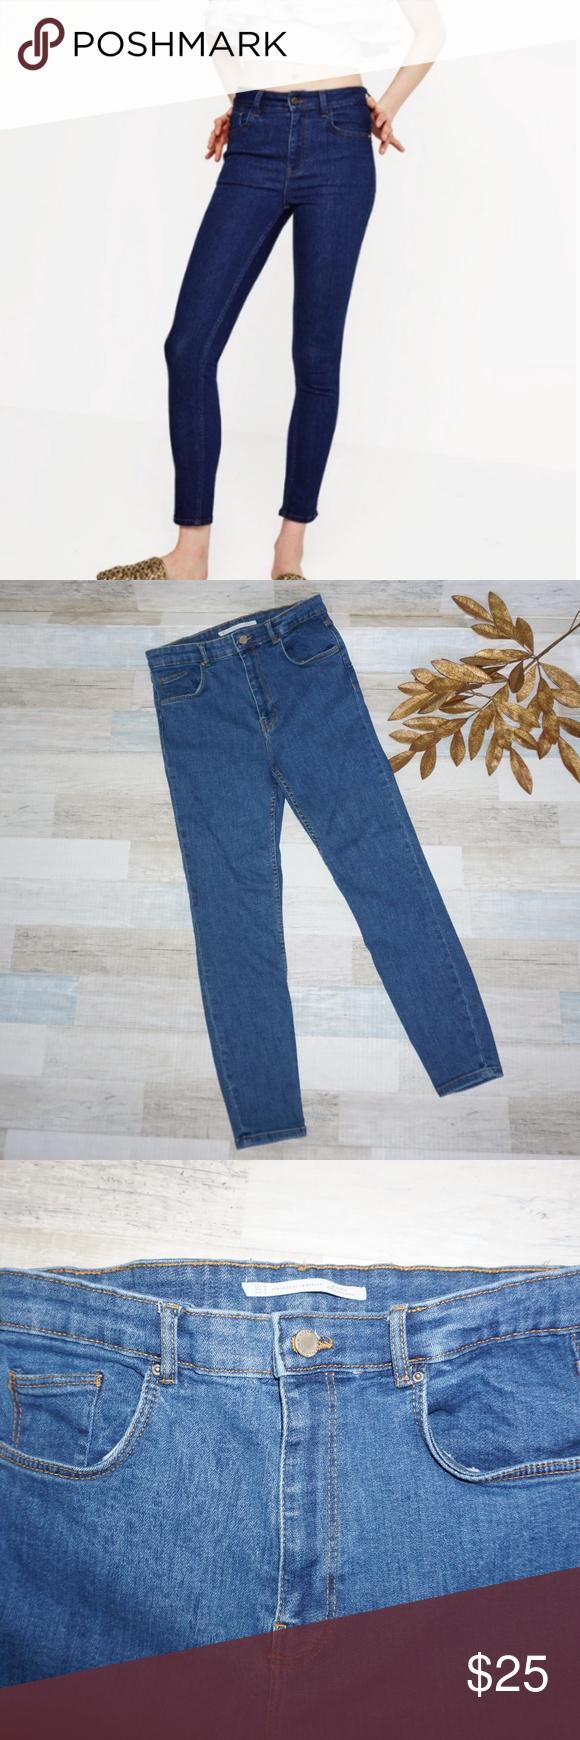 300e41be Zara Trafaluc High Rise Skinny Jeans - Size 10 Zara Trafaluc High Rise Skinny  Jeans -